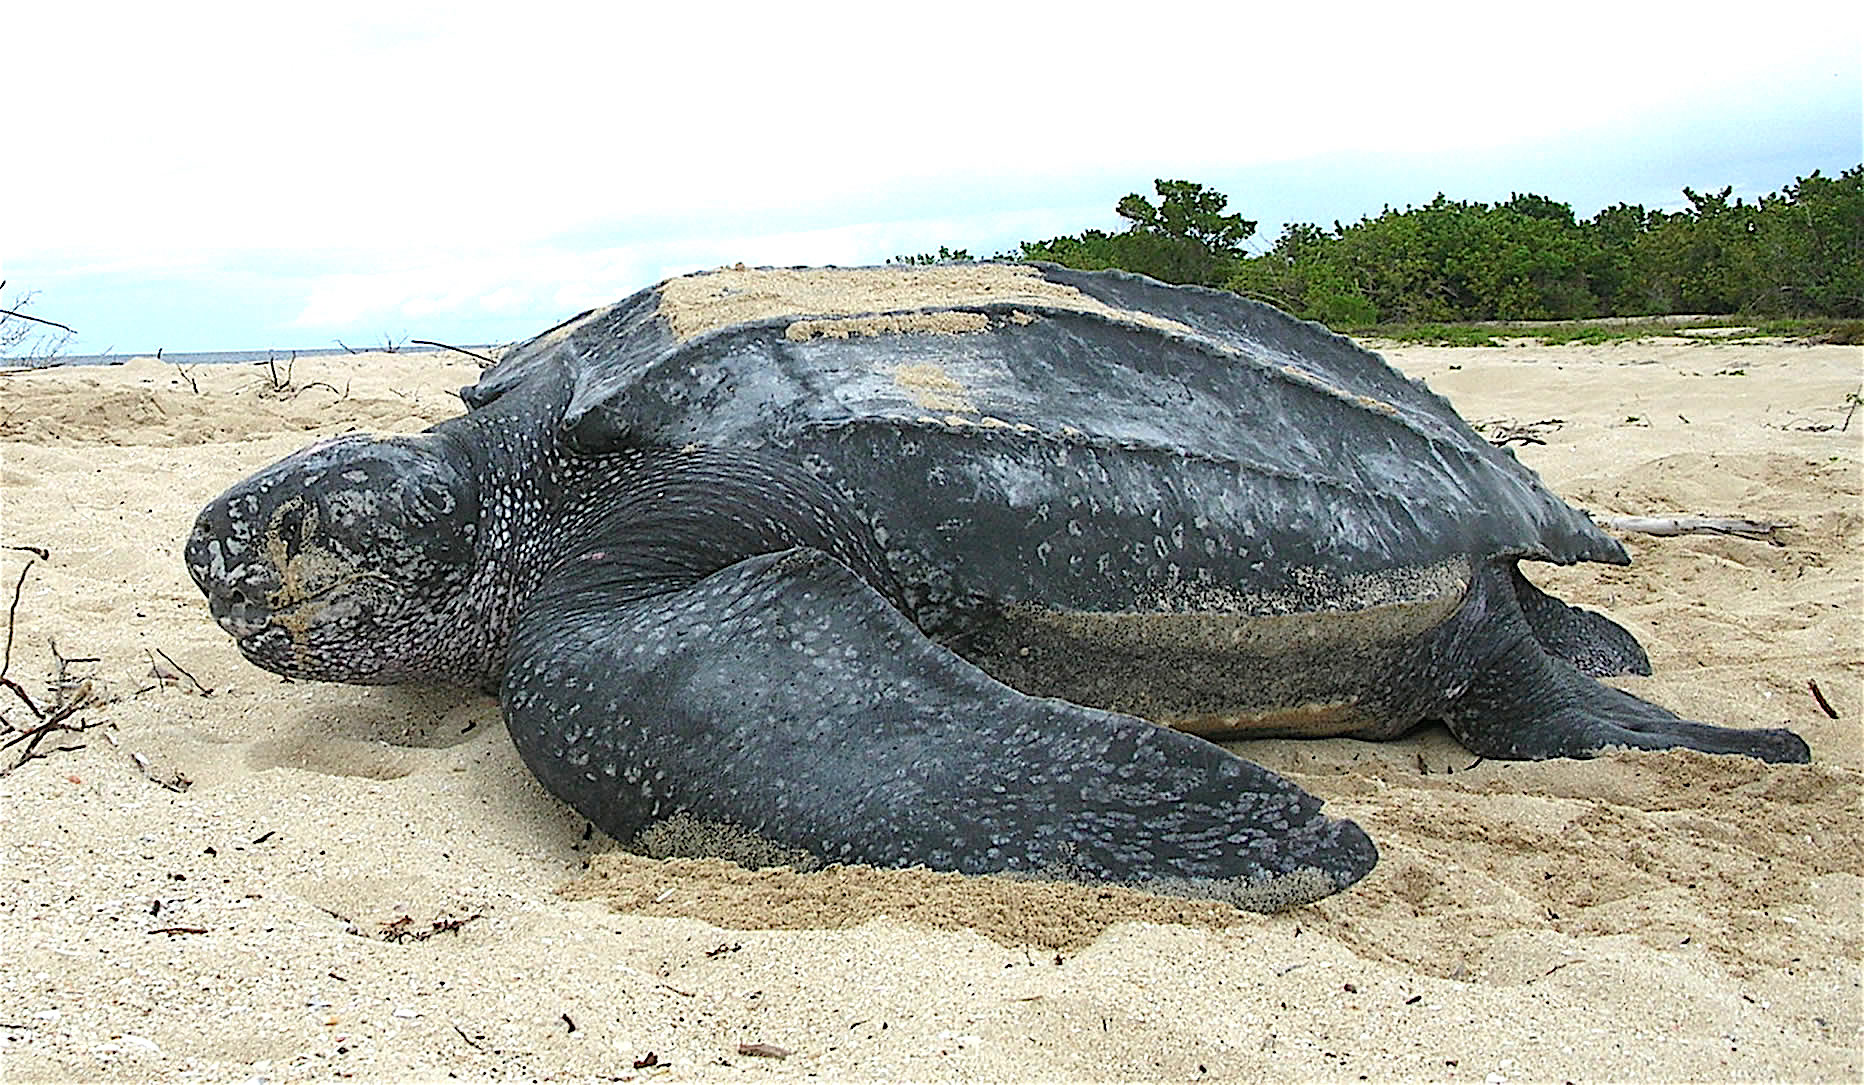 Leatherback Sea Turtle, Credit: Wikimedia Commons